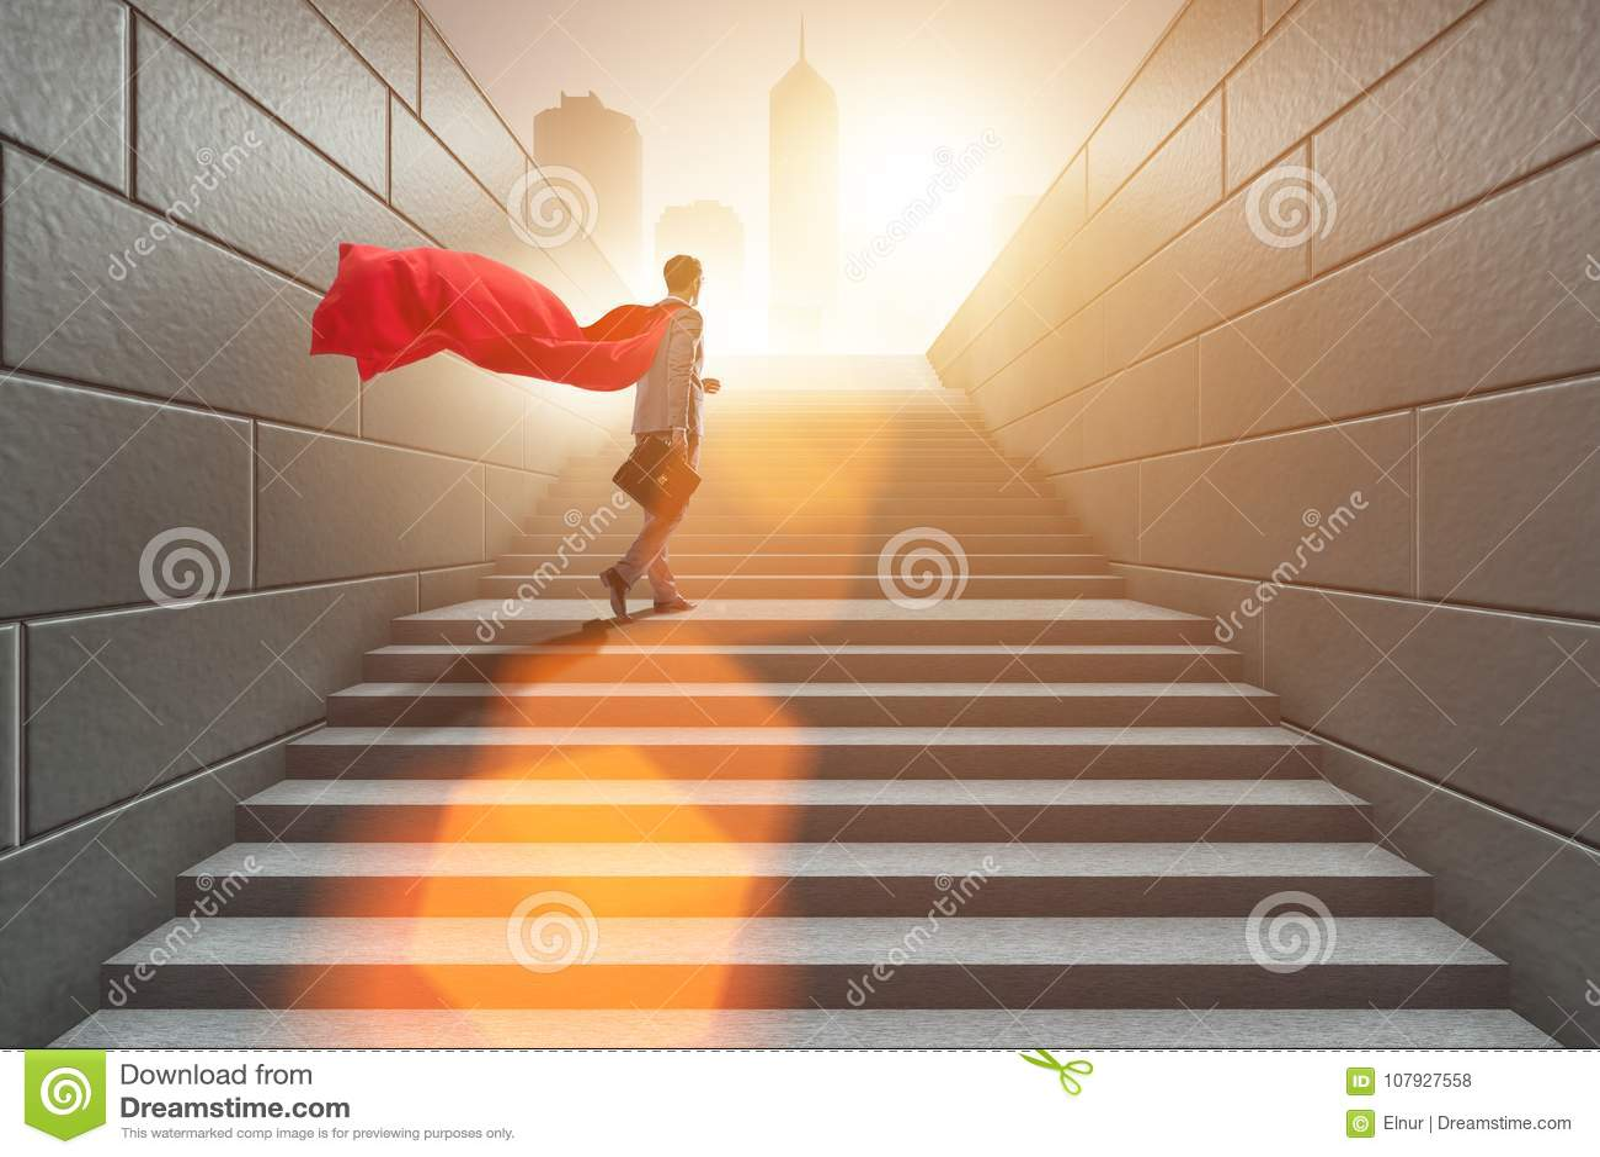 The businessman superhero successful in career ladder concept